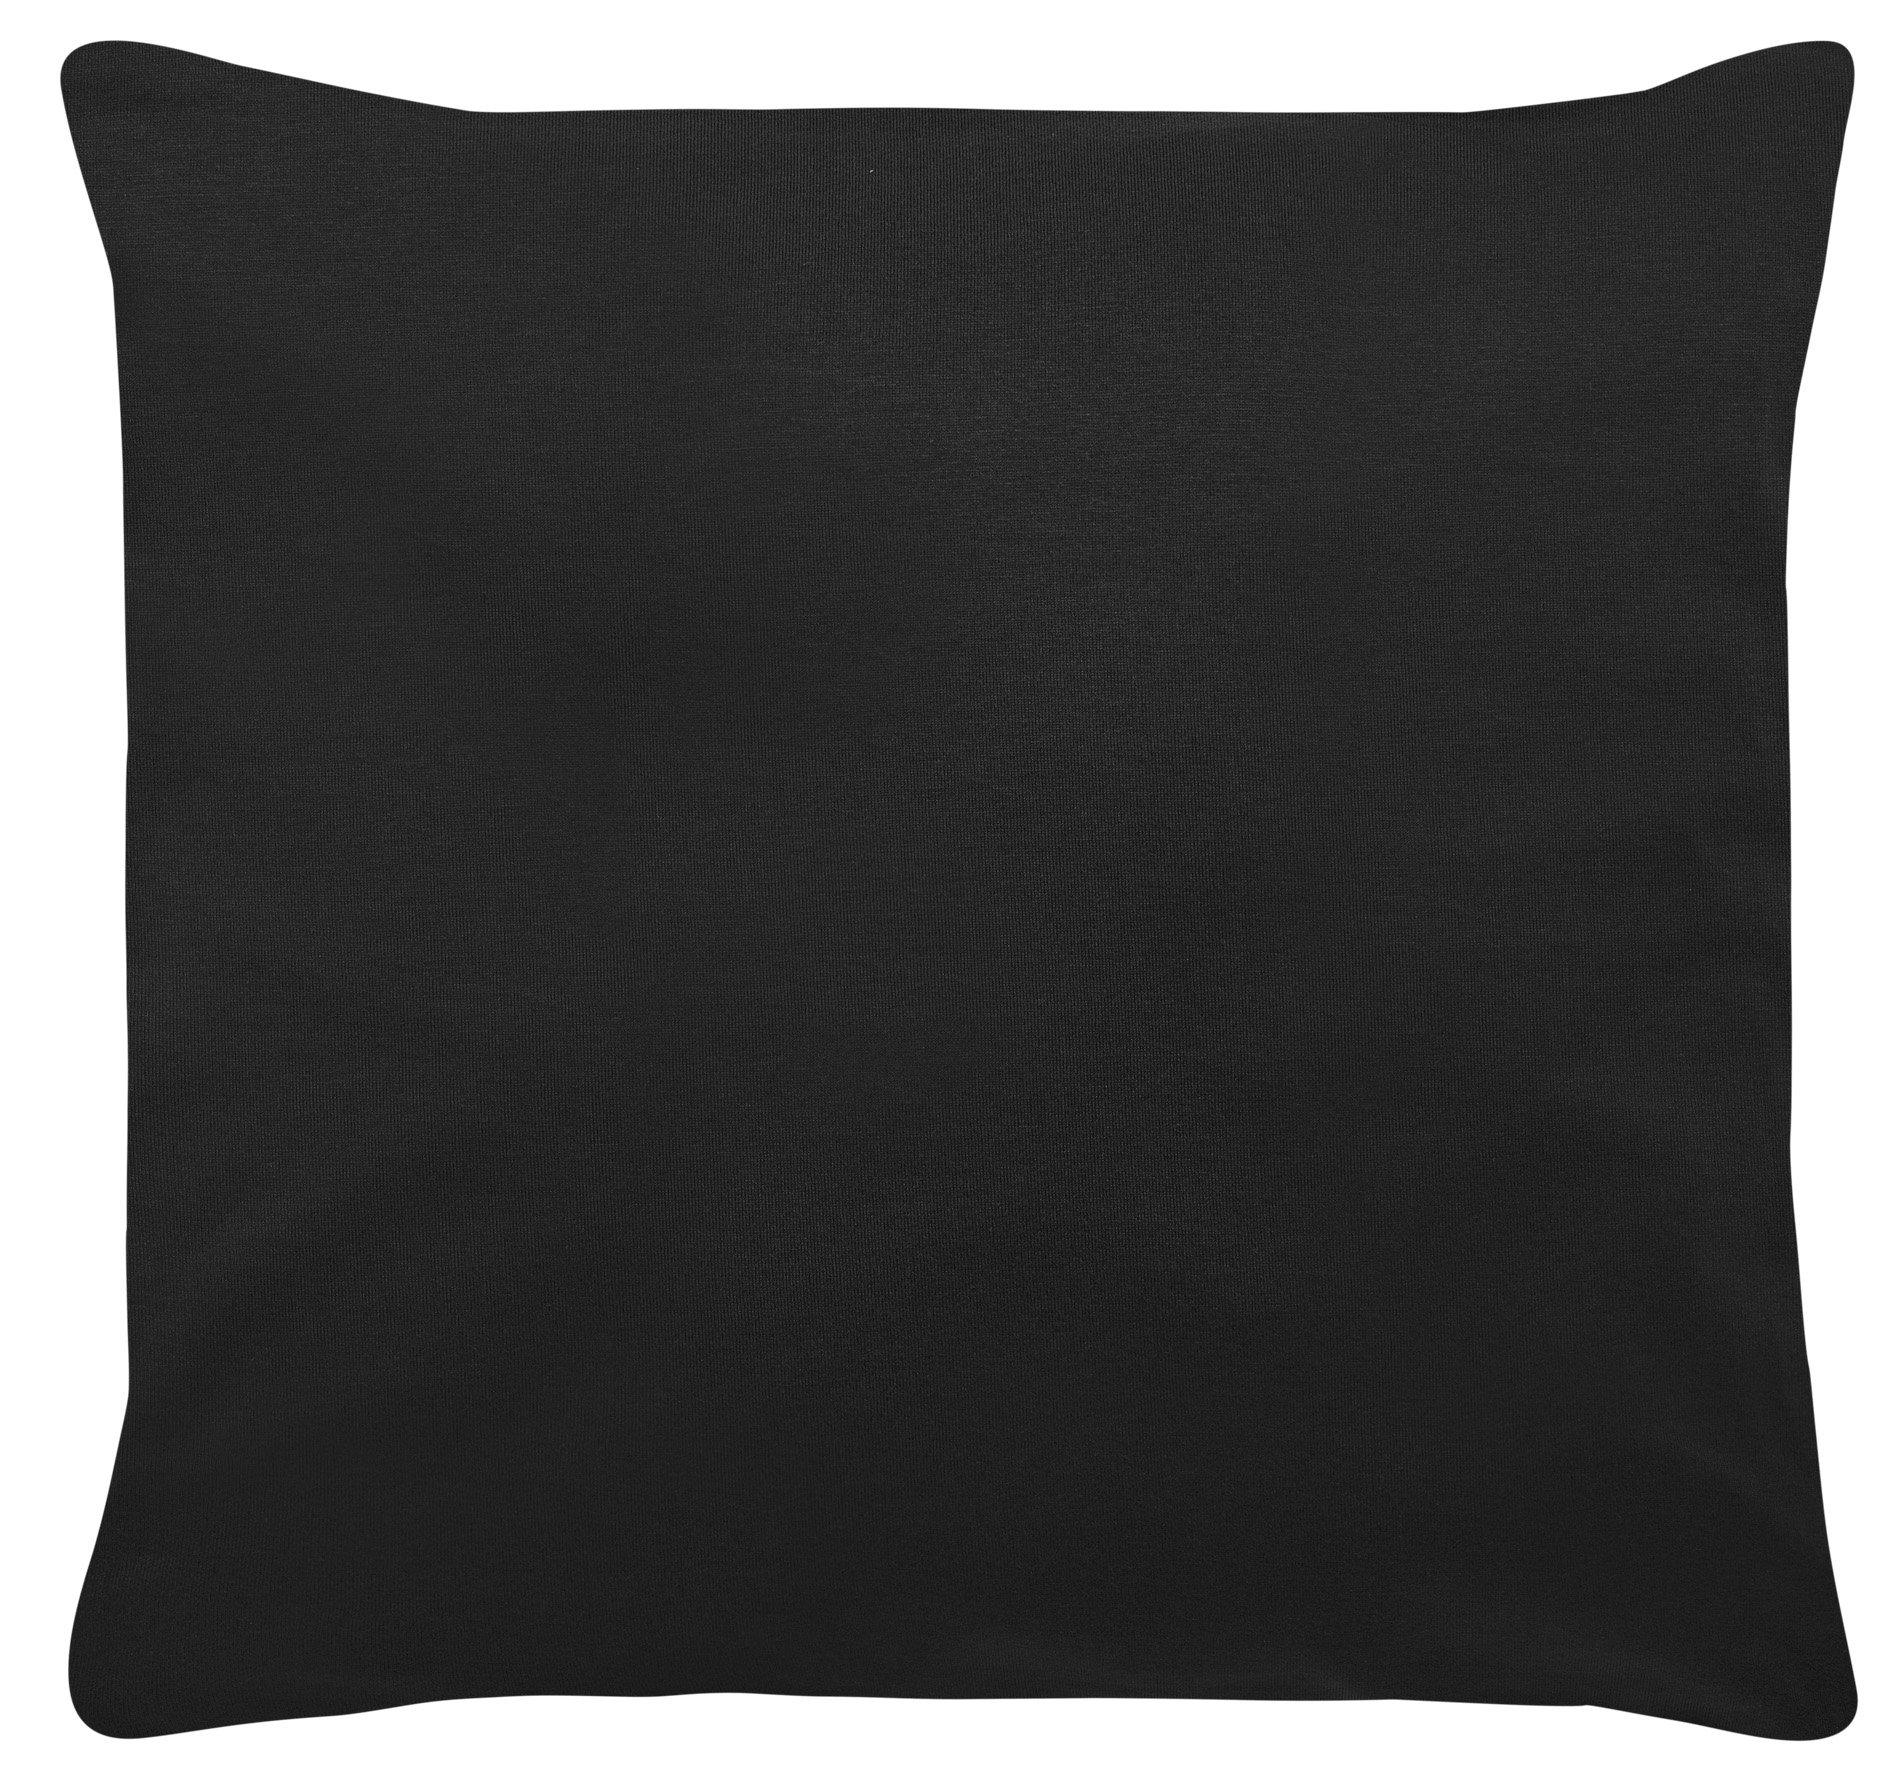 K.-Bezug schwarz 40x40cm